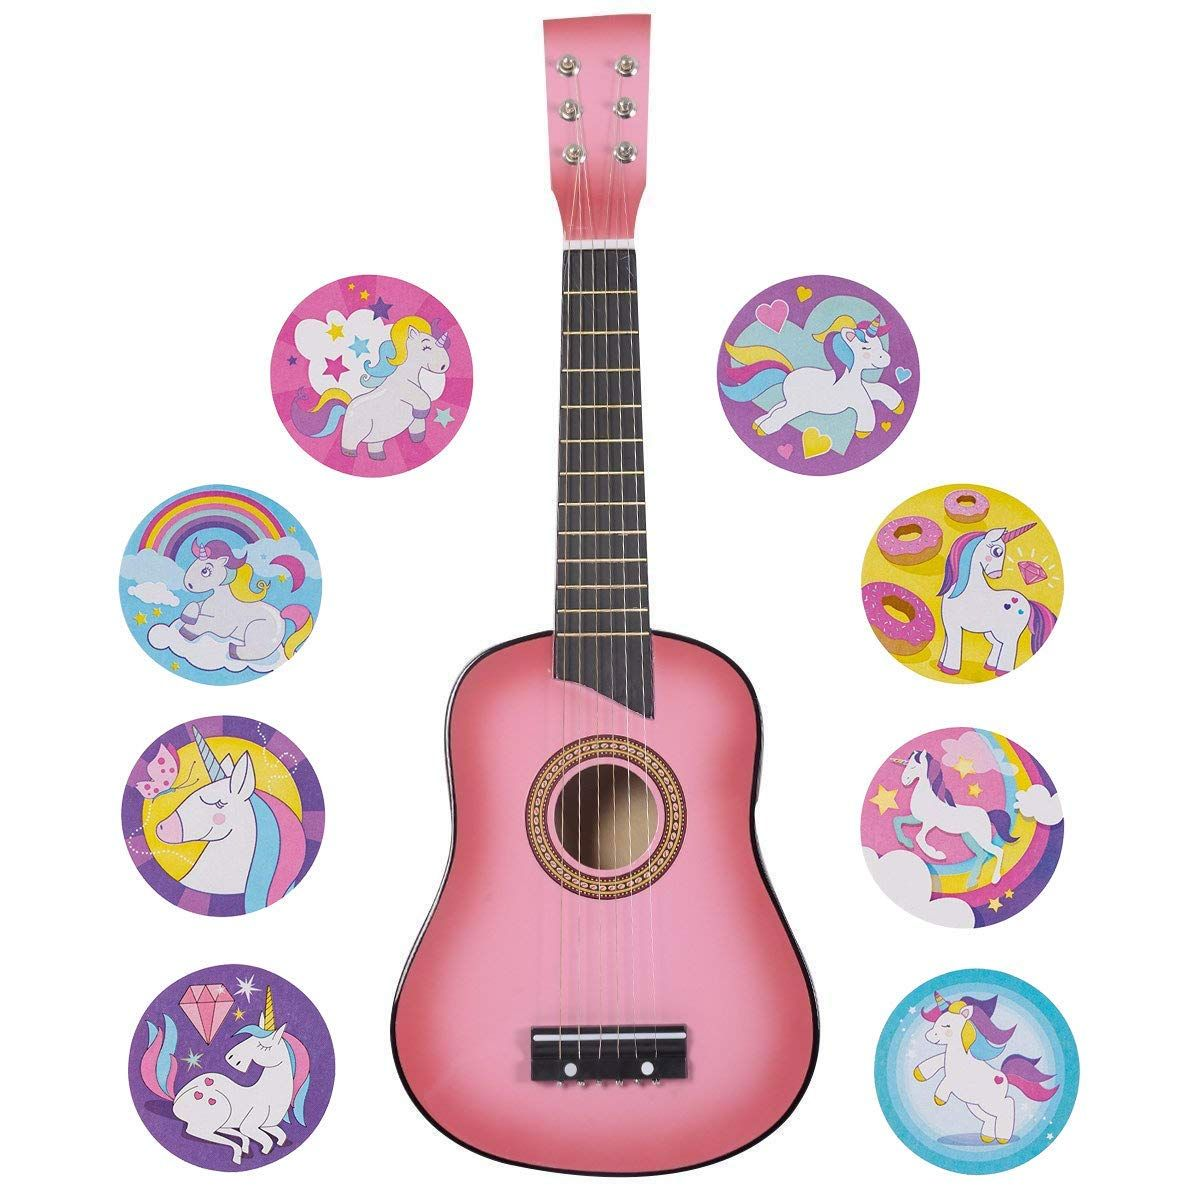 Amazon Com Pink Guitar For Kids 25 Acoustic Beginners W 100 Unicorn Stickers Garden Outdoor Pink Guitar Guitar Kids Pink